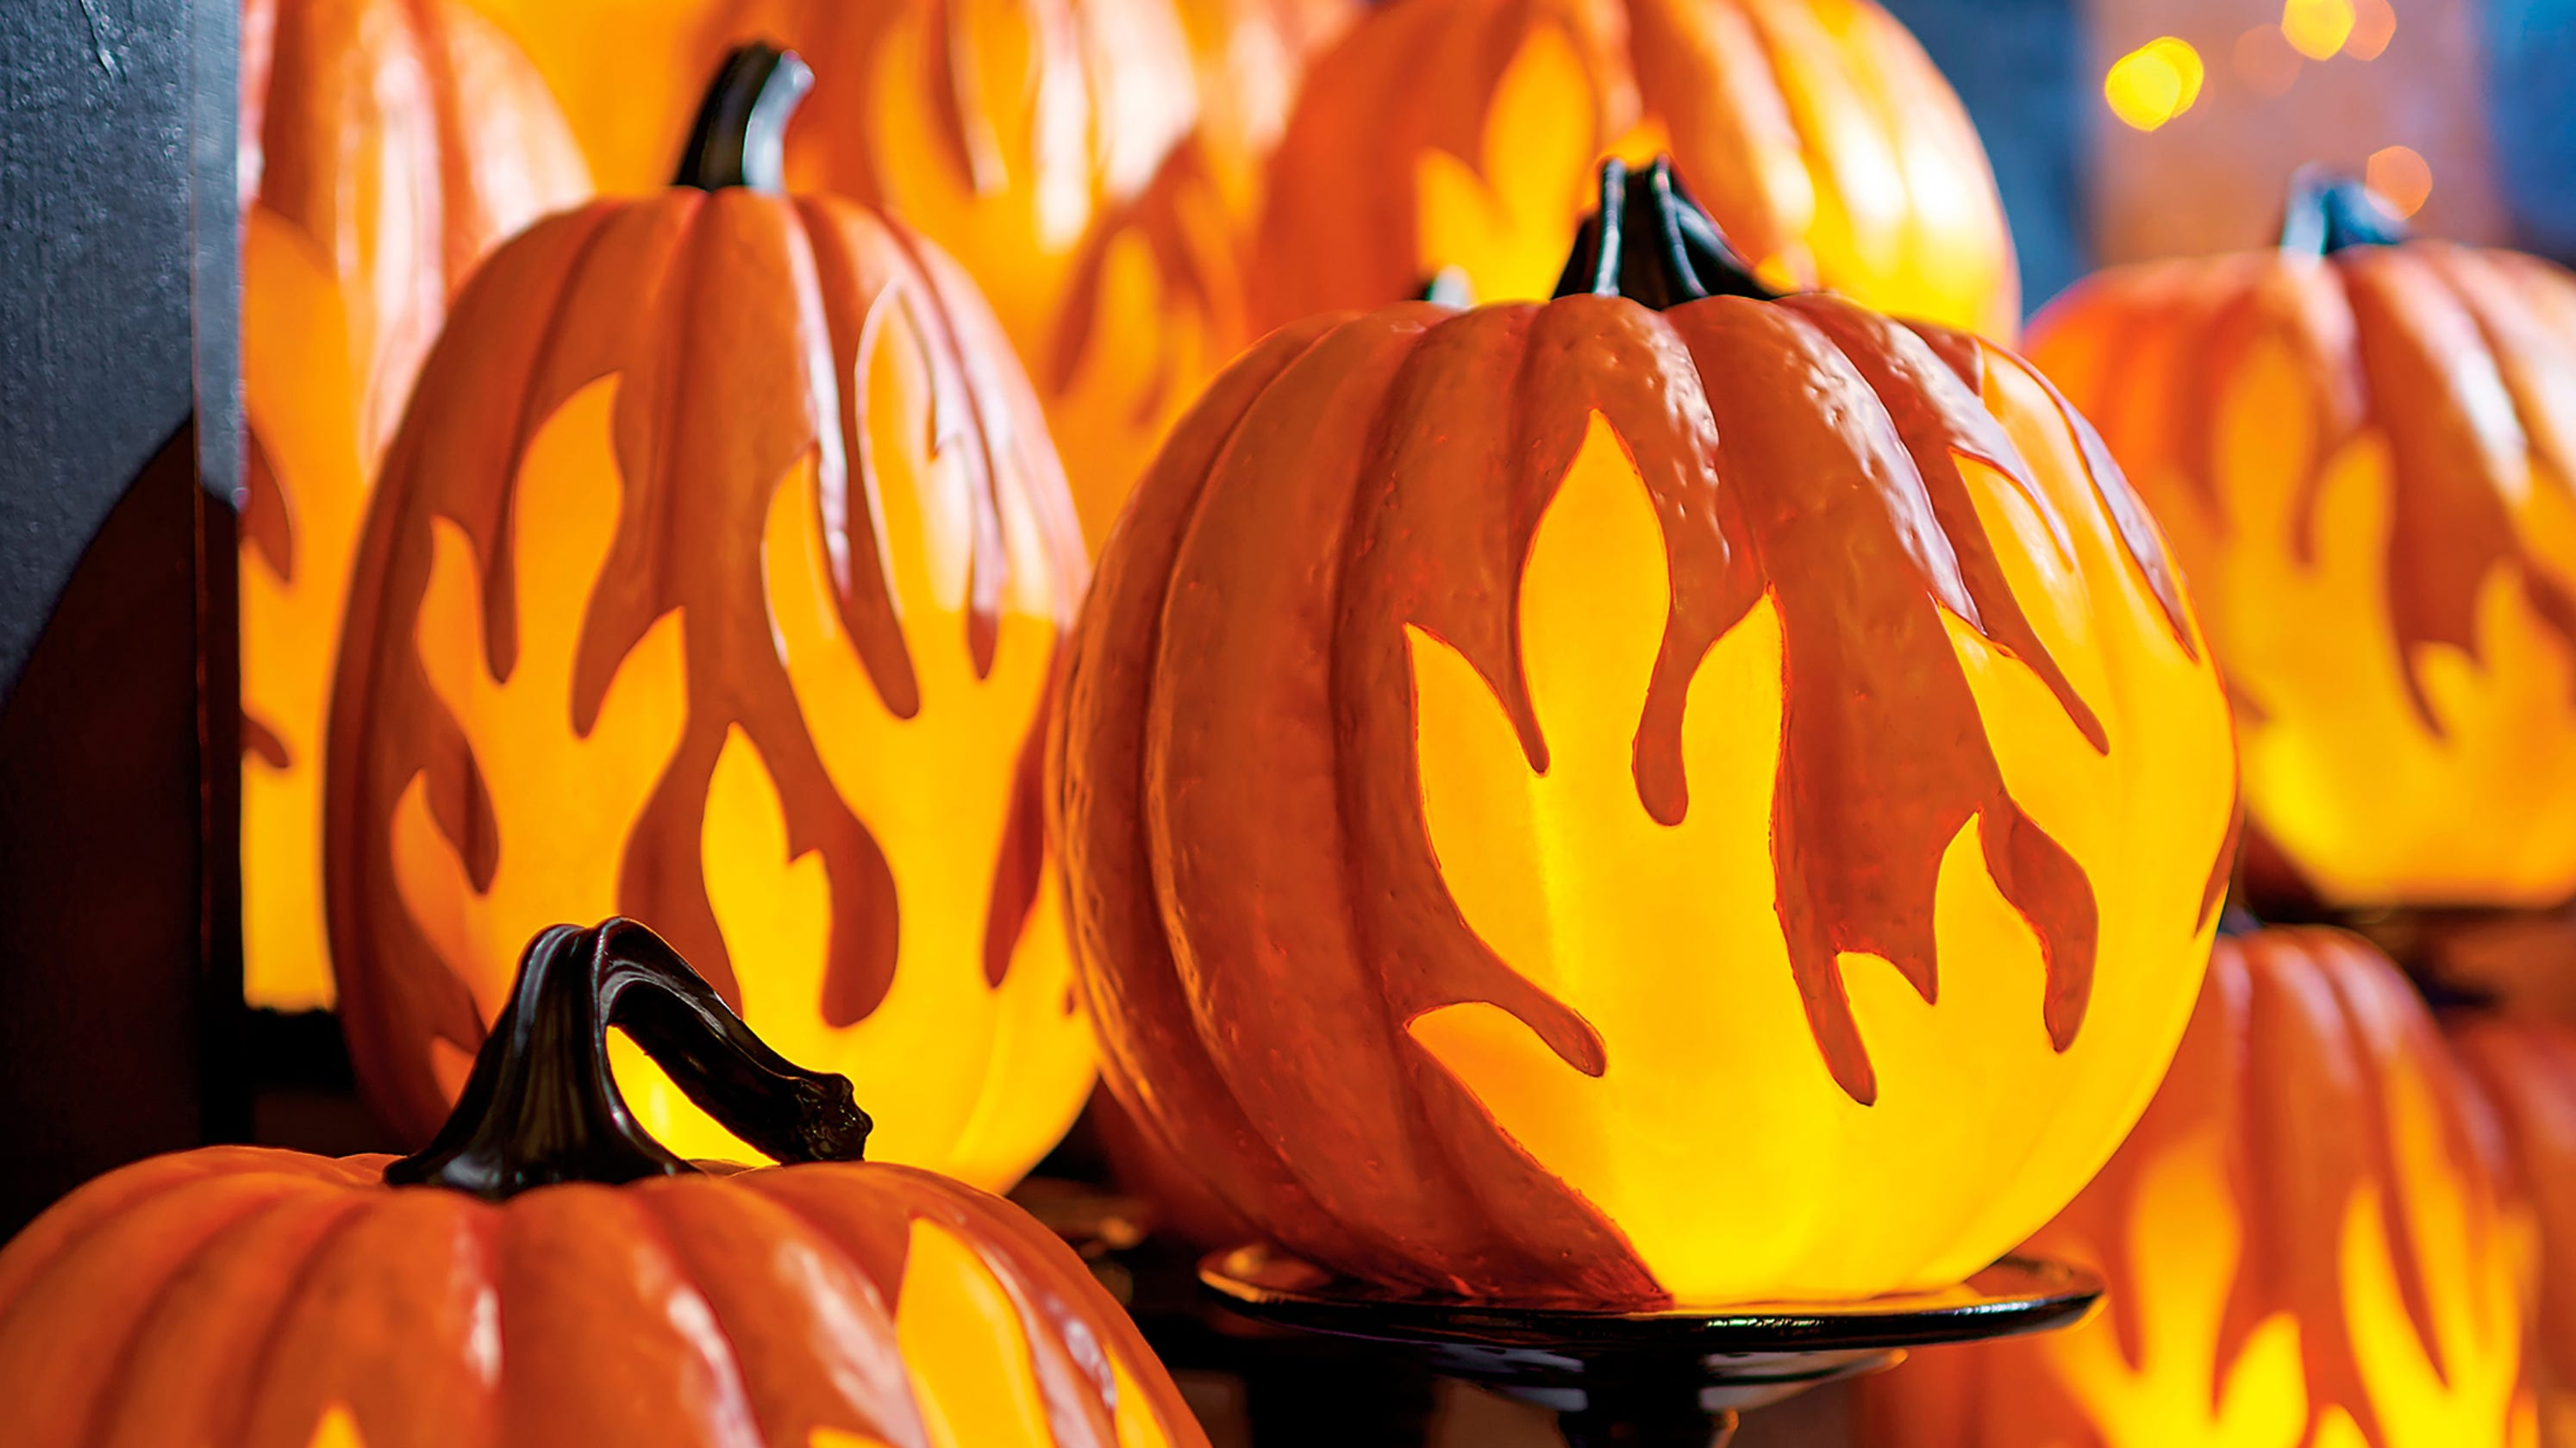 Spooktacular Decor Arrives As Halloween Popularity Booms Thread Realistic Electric Flickering Pillar Candles